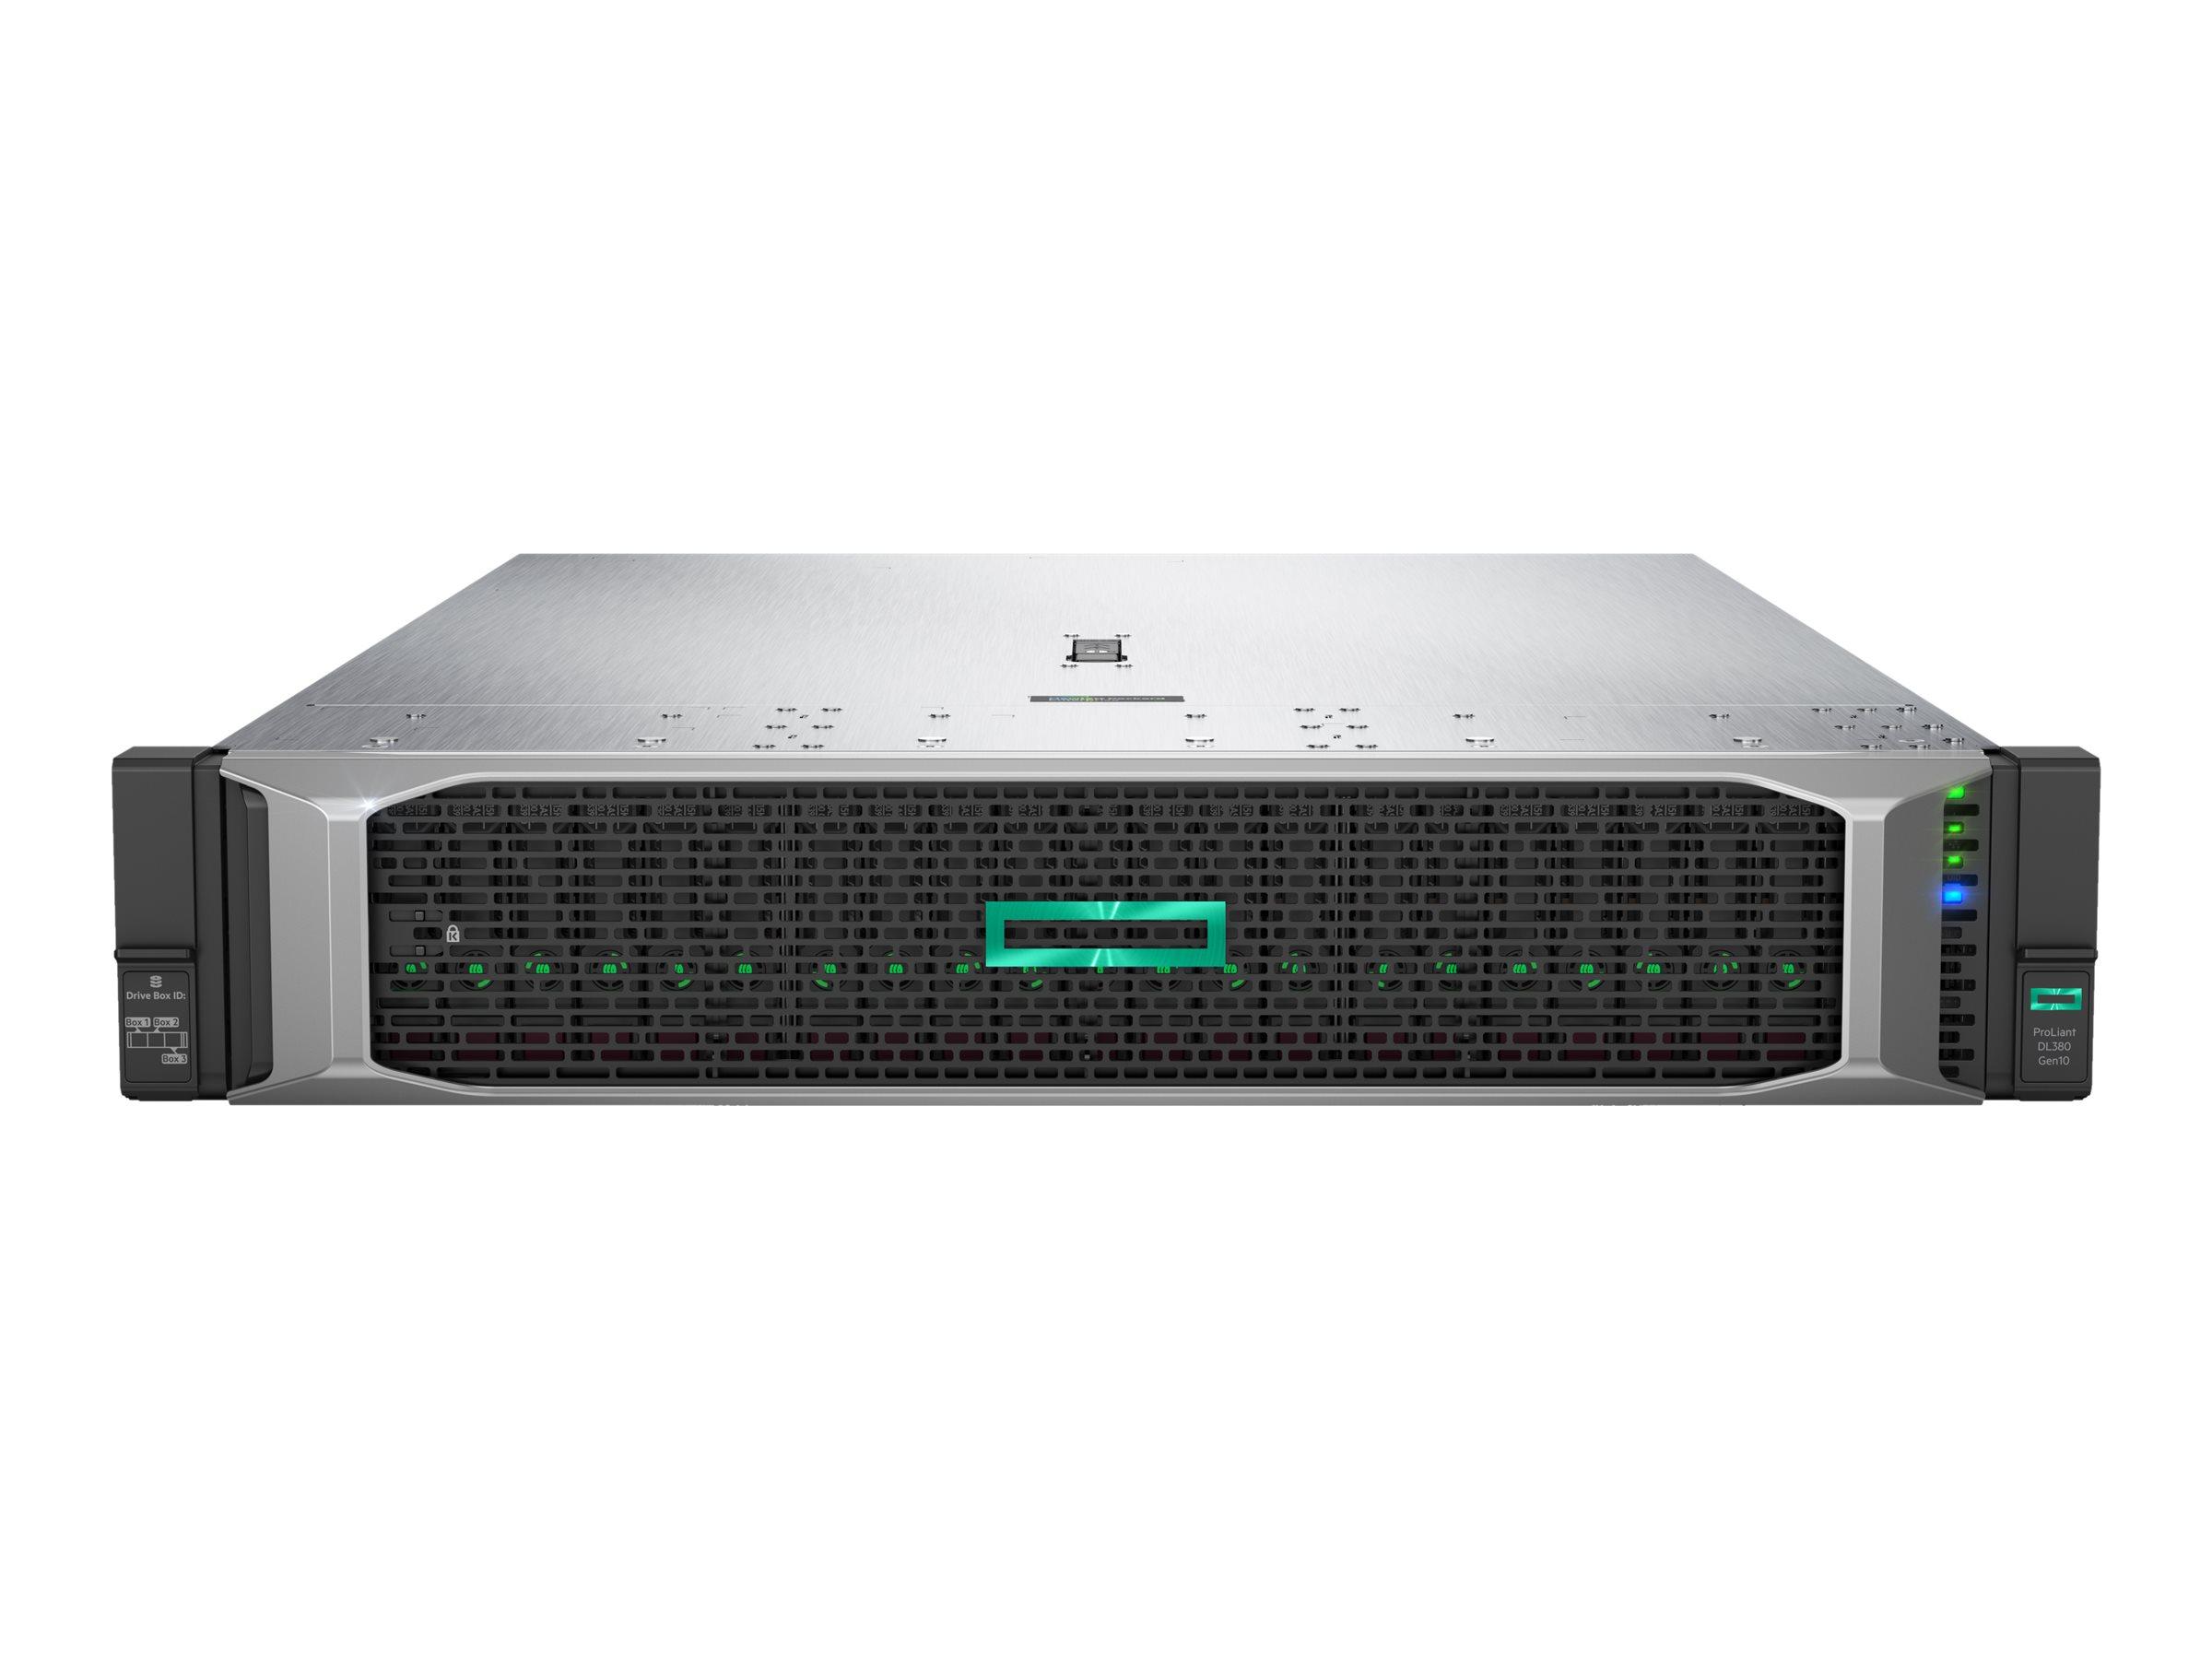 HPE ProLiant DL380 Gen10 Entry - Server - Rack-Montage - 2U - zweiweg - 1 x Xeon Bronze 3104 / 1.7 GHz